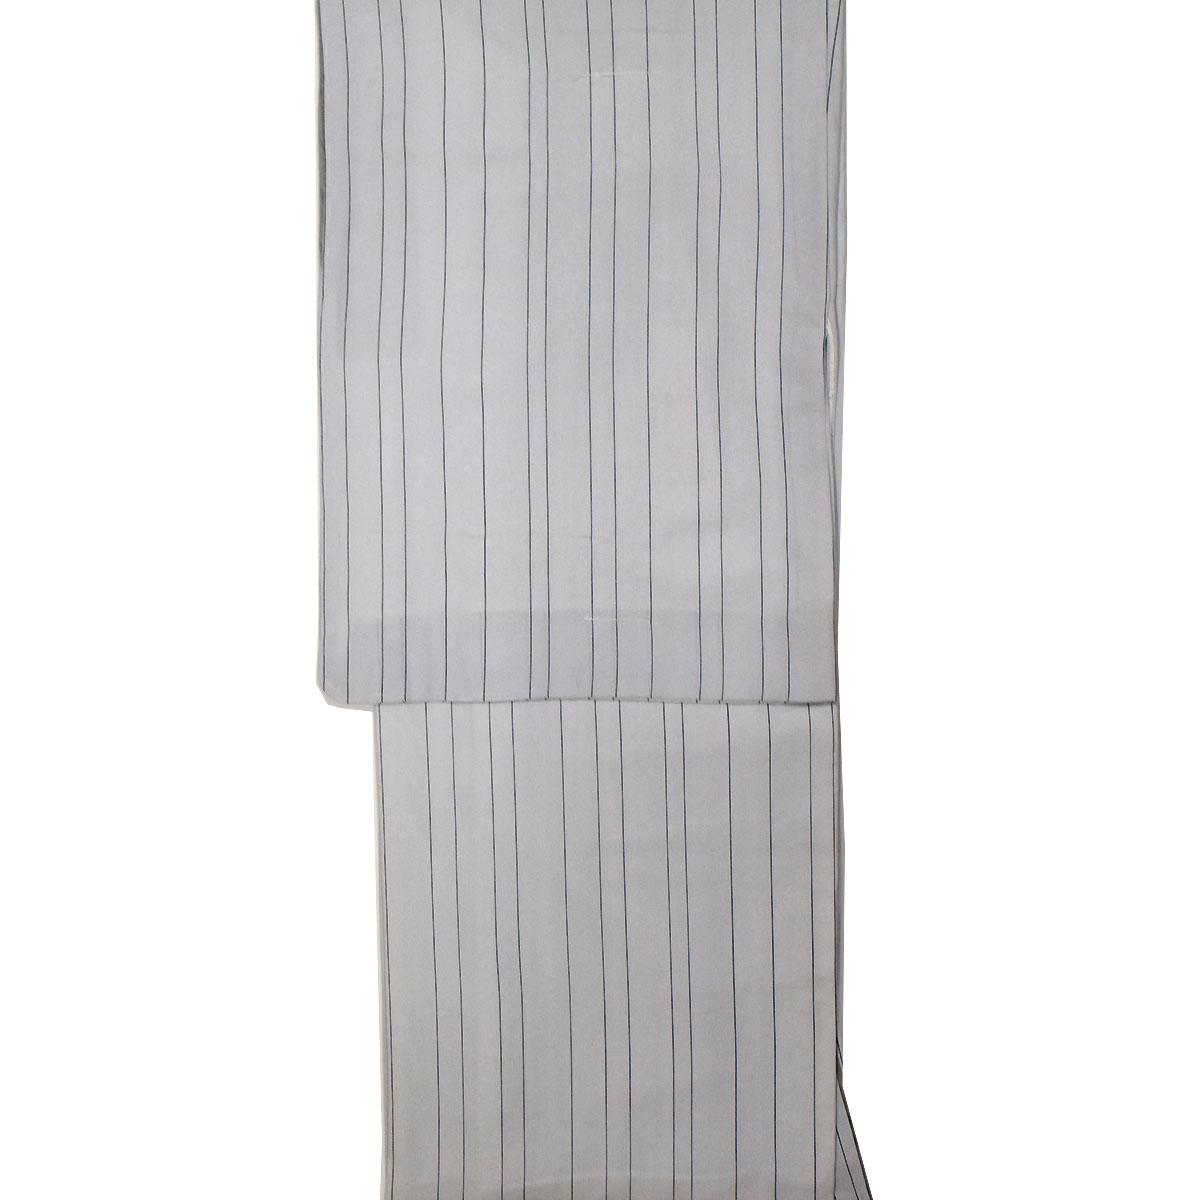 【L寸】 洗える着物 【 袷 】 【 仕立て上がり 】 洗える 着物 単品商品番号d914-53